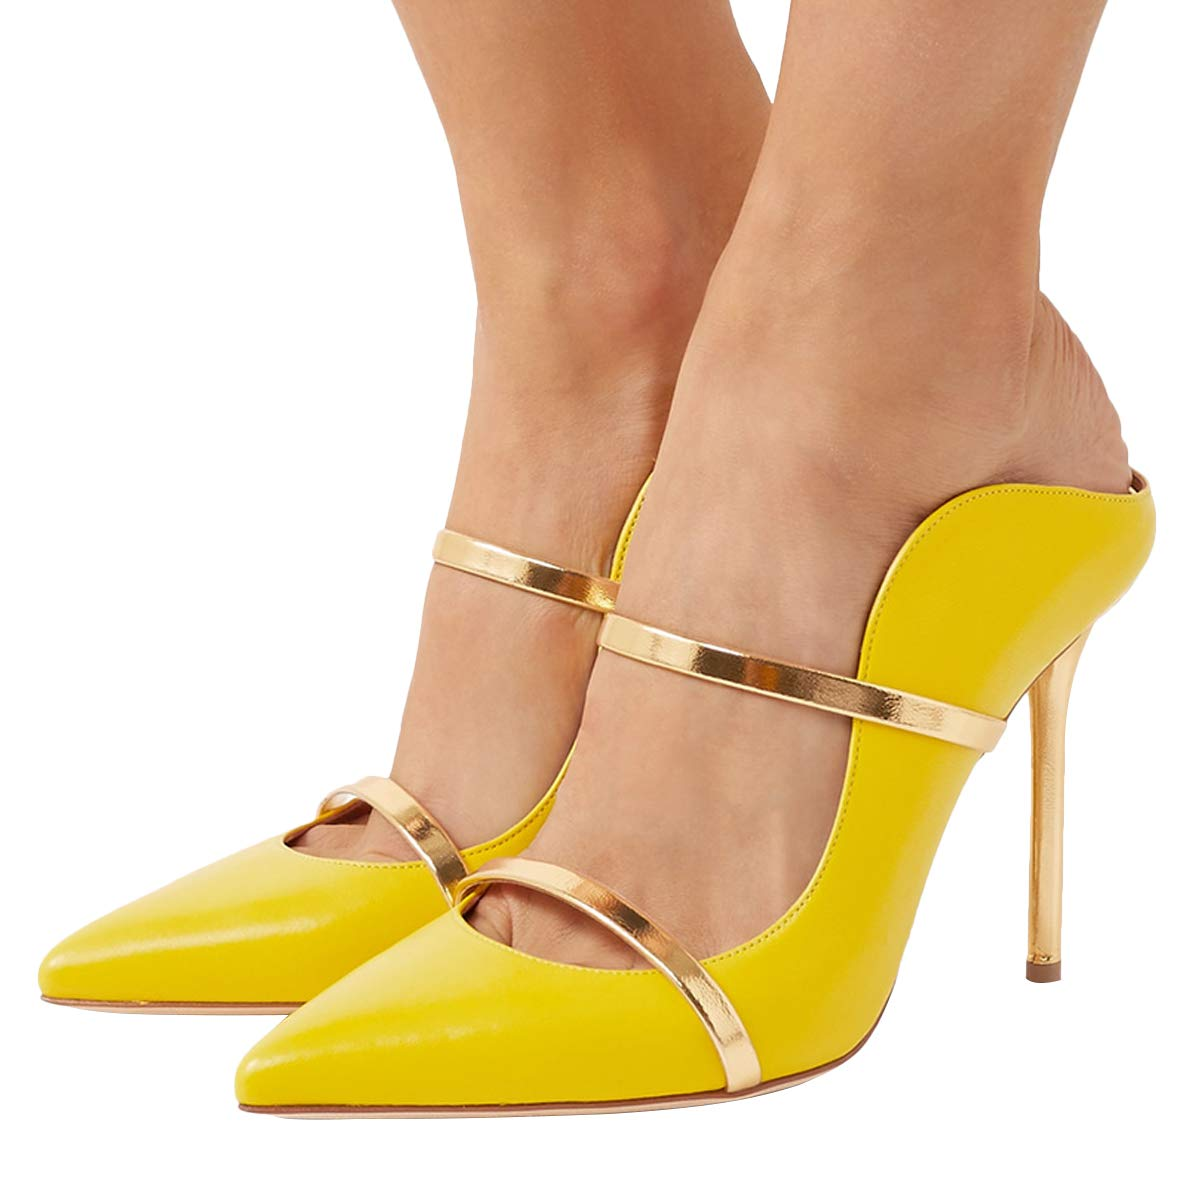 8c3fcd8f0d1da FSJ Women Fashion Pointy Toe Pumps High Heels Mule Sandals Double Straps  Slide Shoes Size 9 Yellow-12 cm